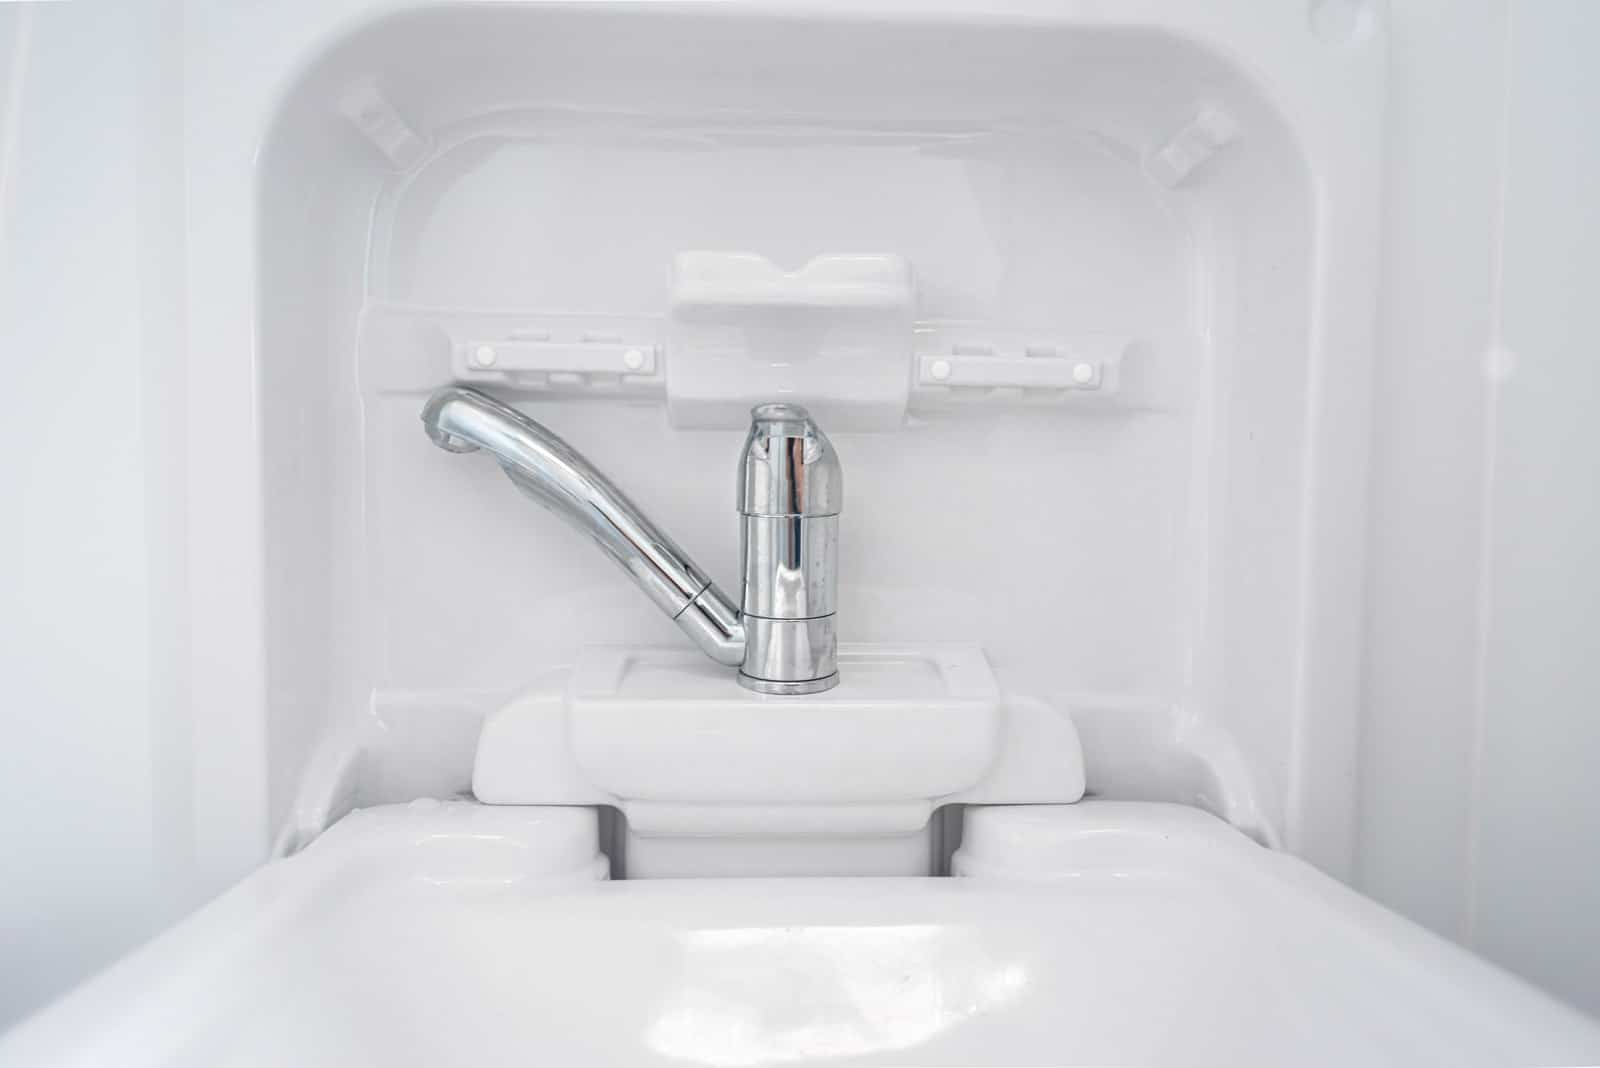 Bathroom sink - campervan water system installation